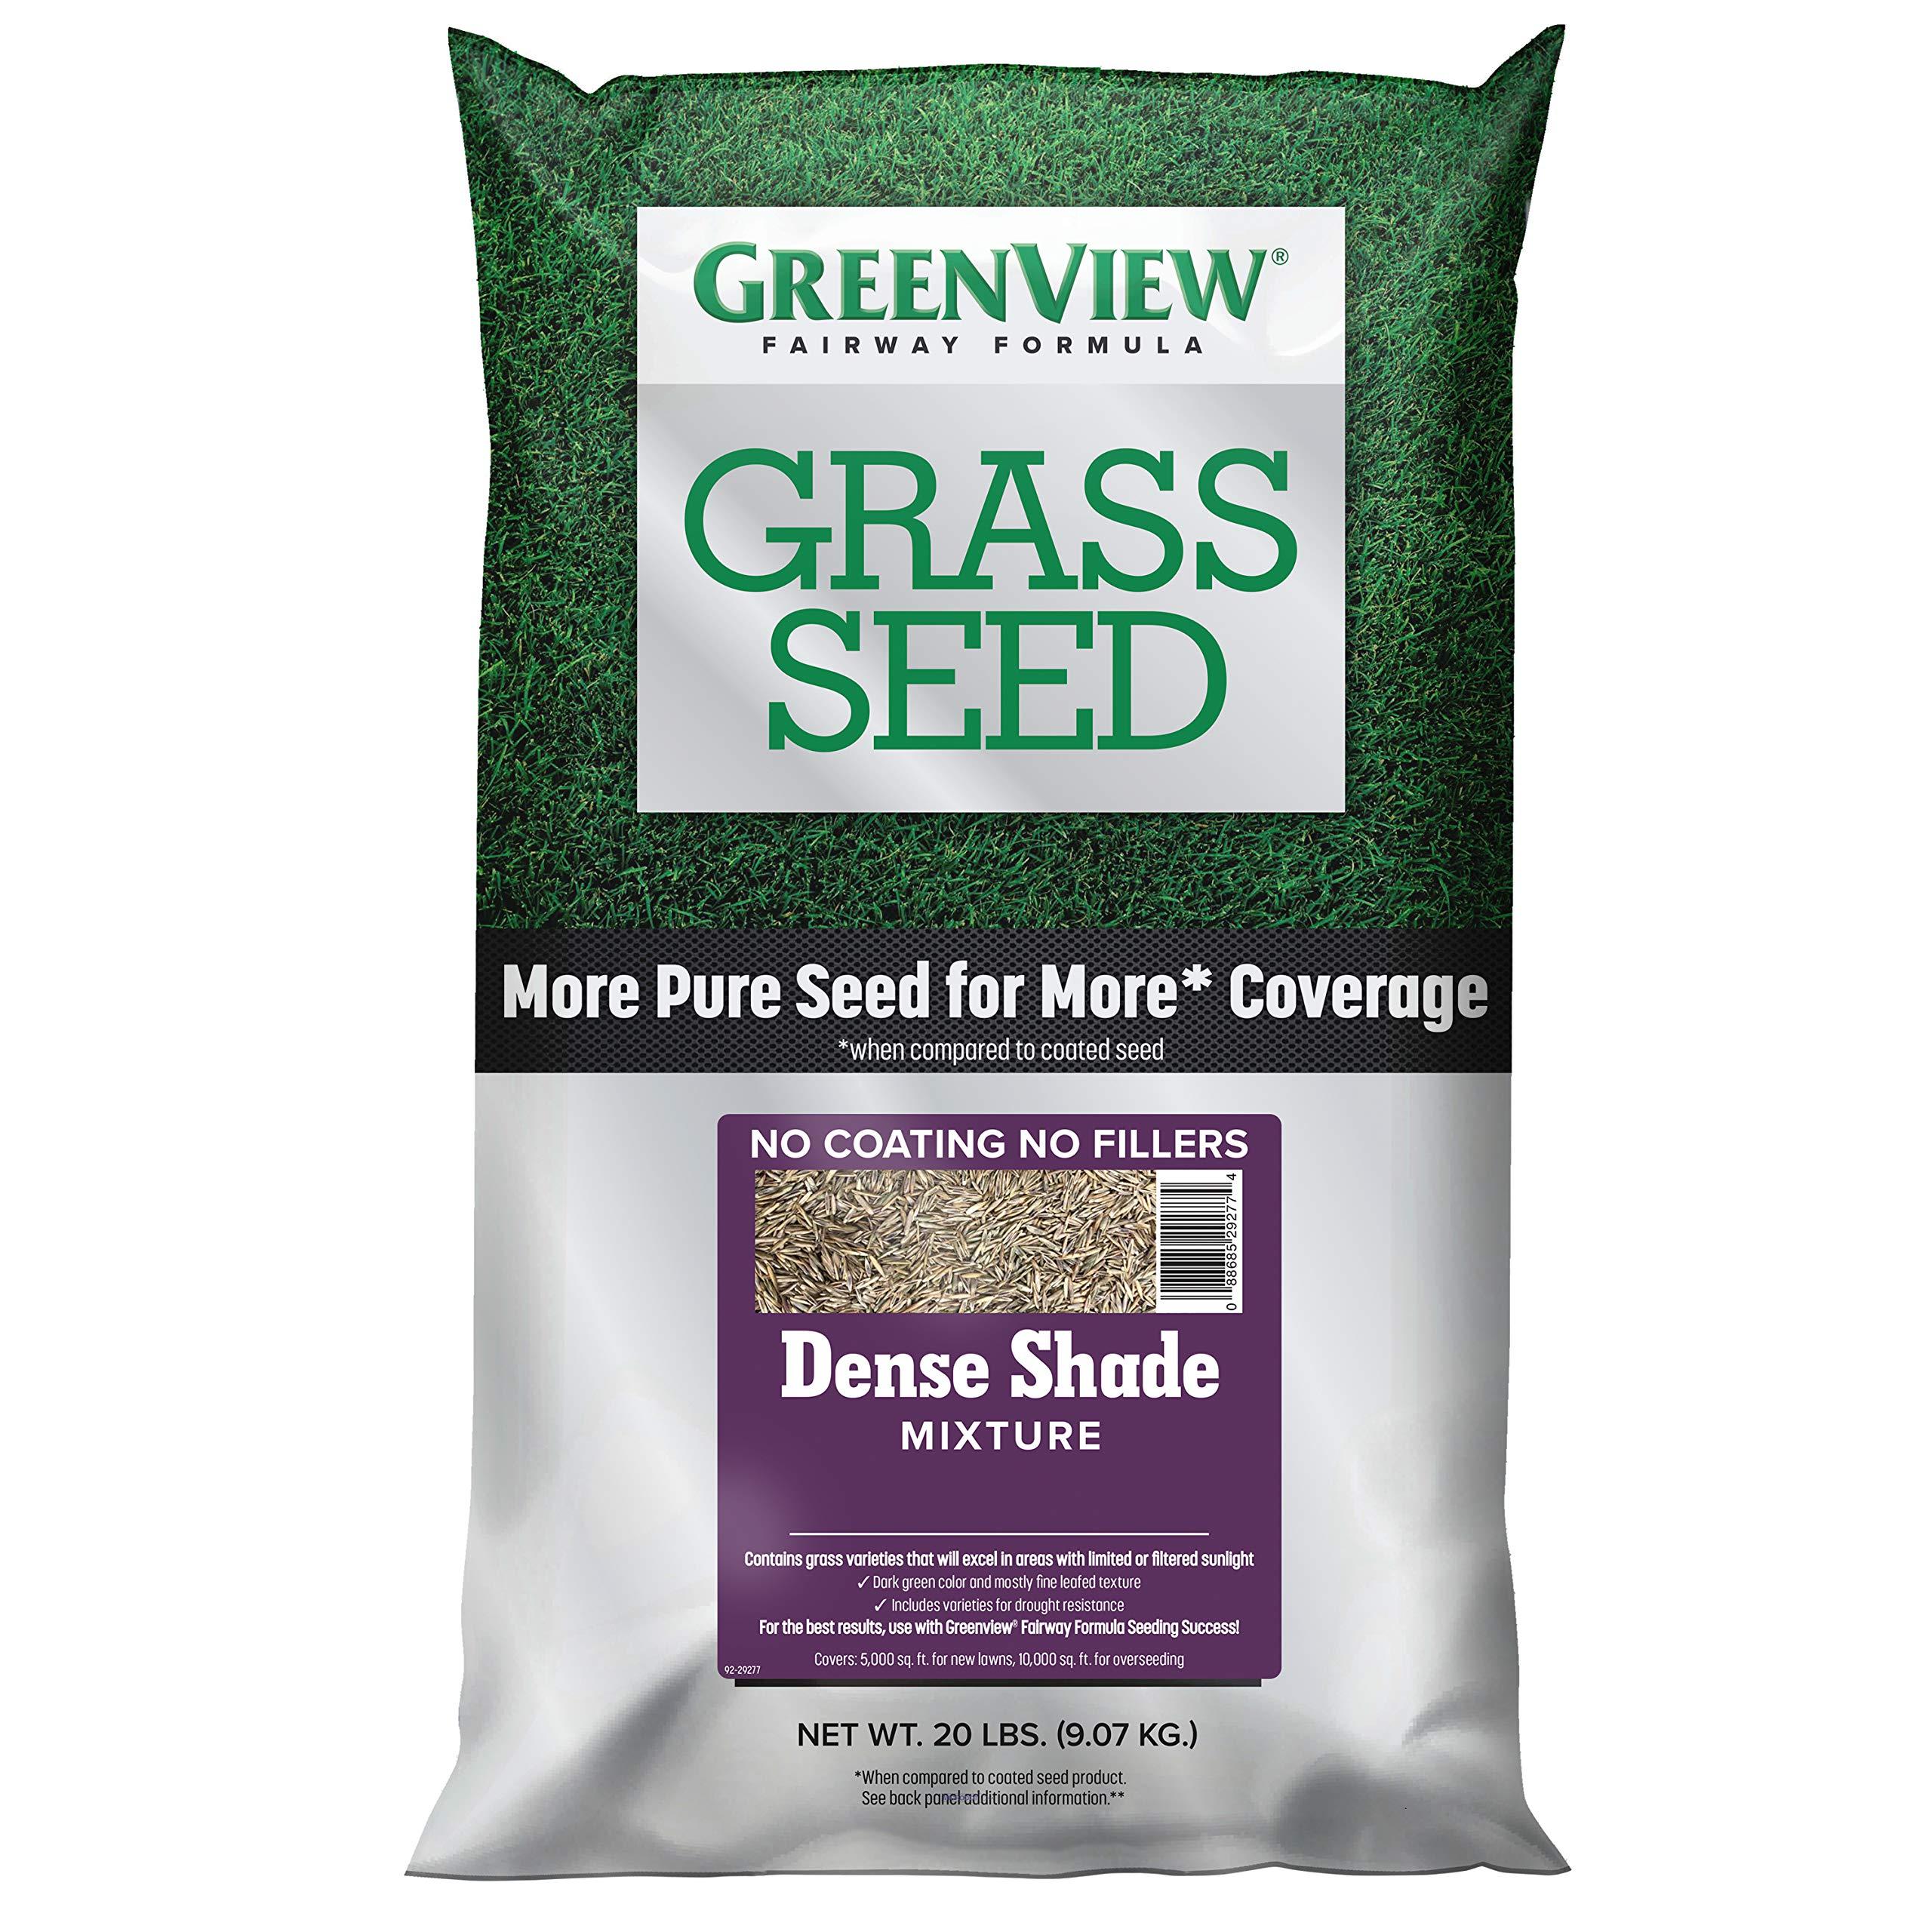 GreenView 2829344 Grass Seed, 20 lb, Dense Shade